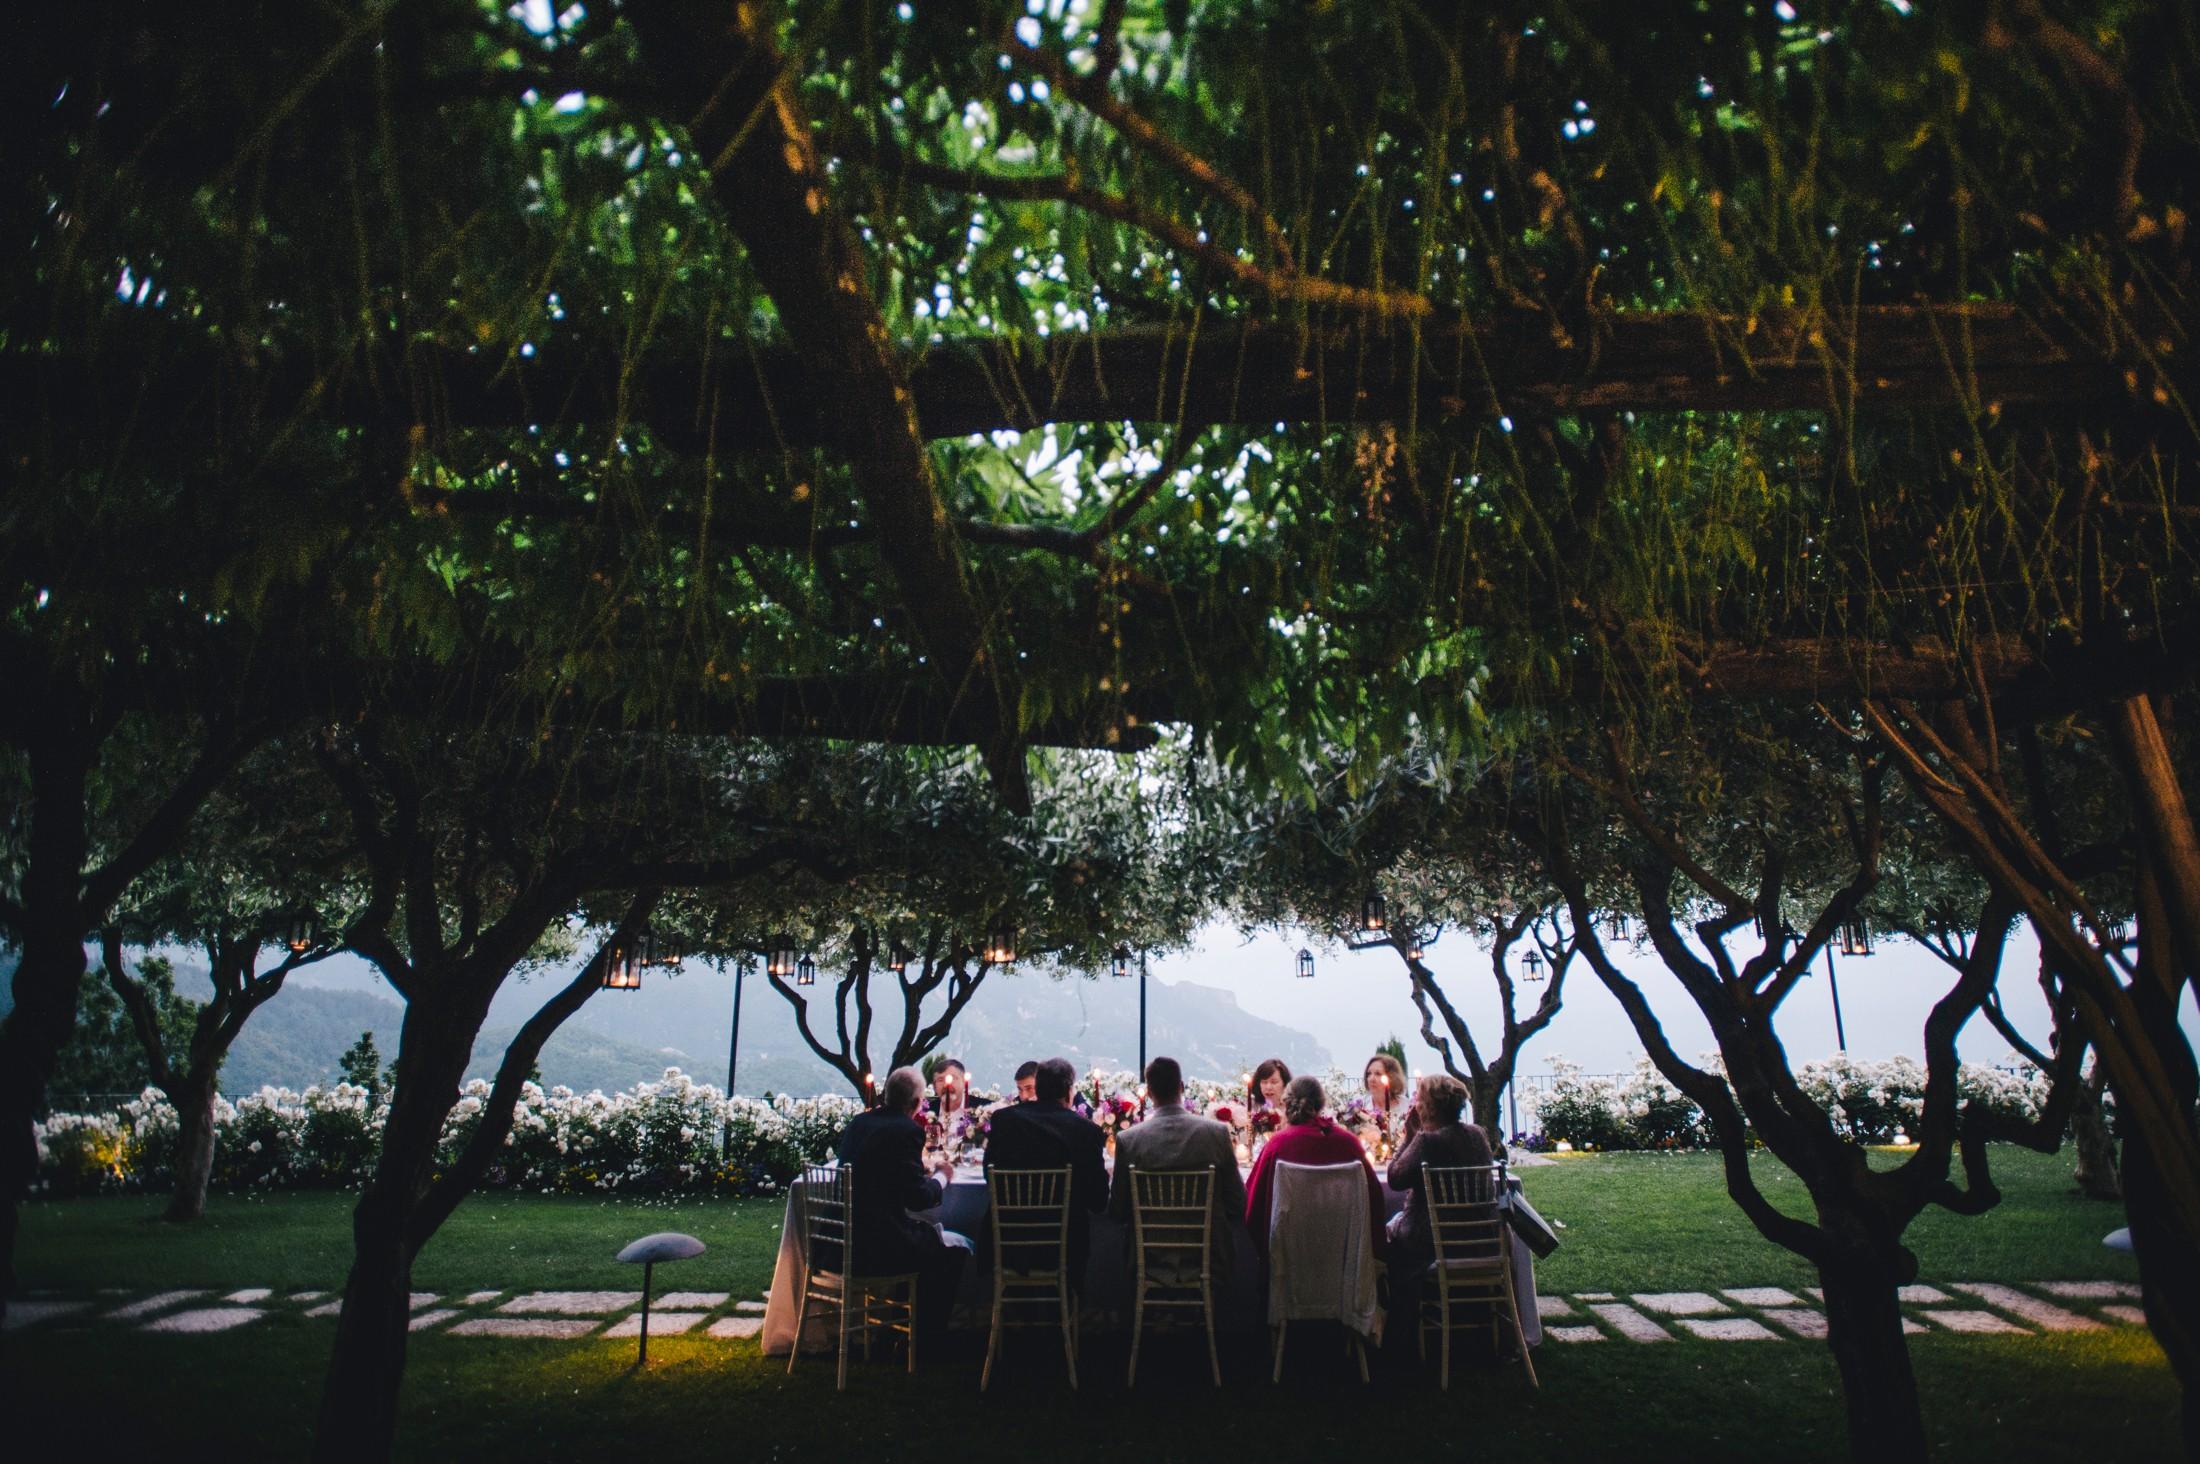 wedding in ravello moment from the wedding dinner